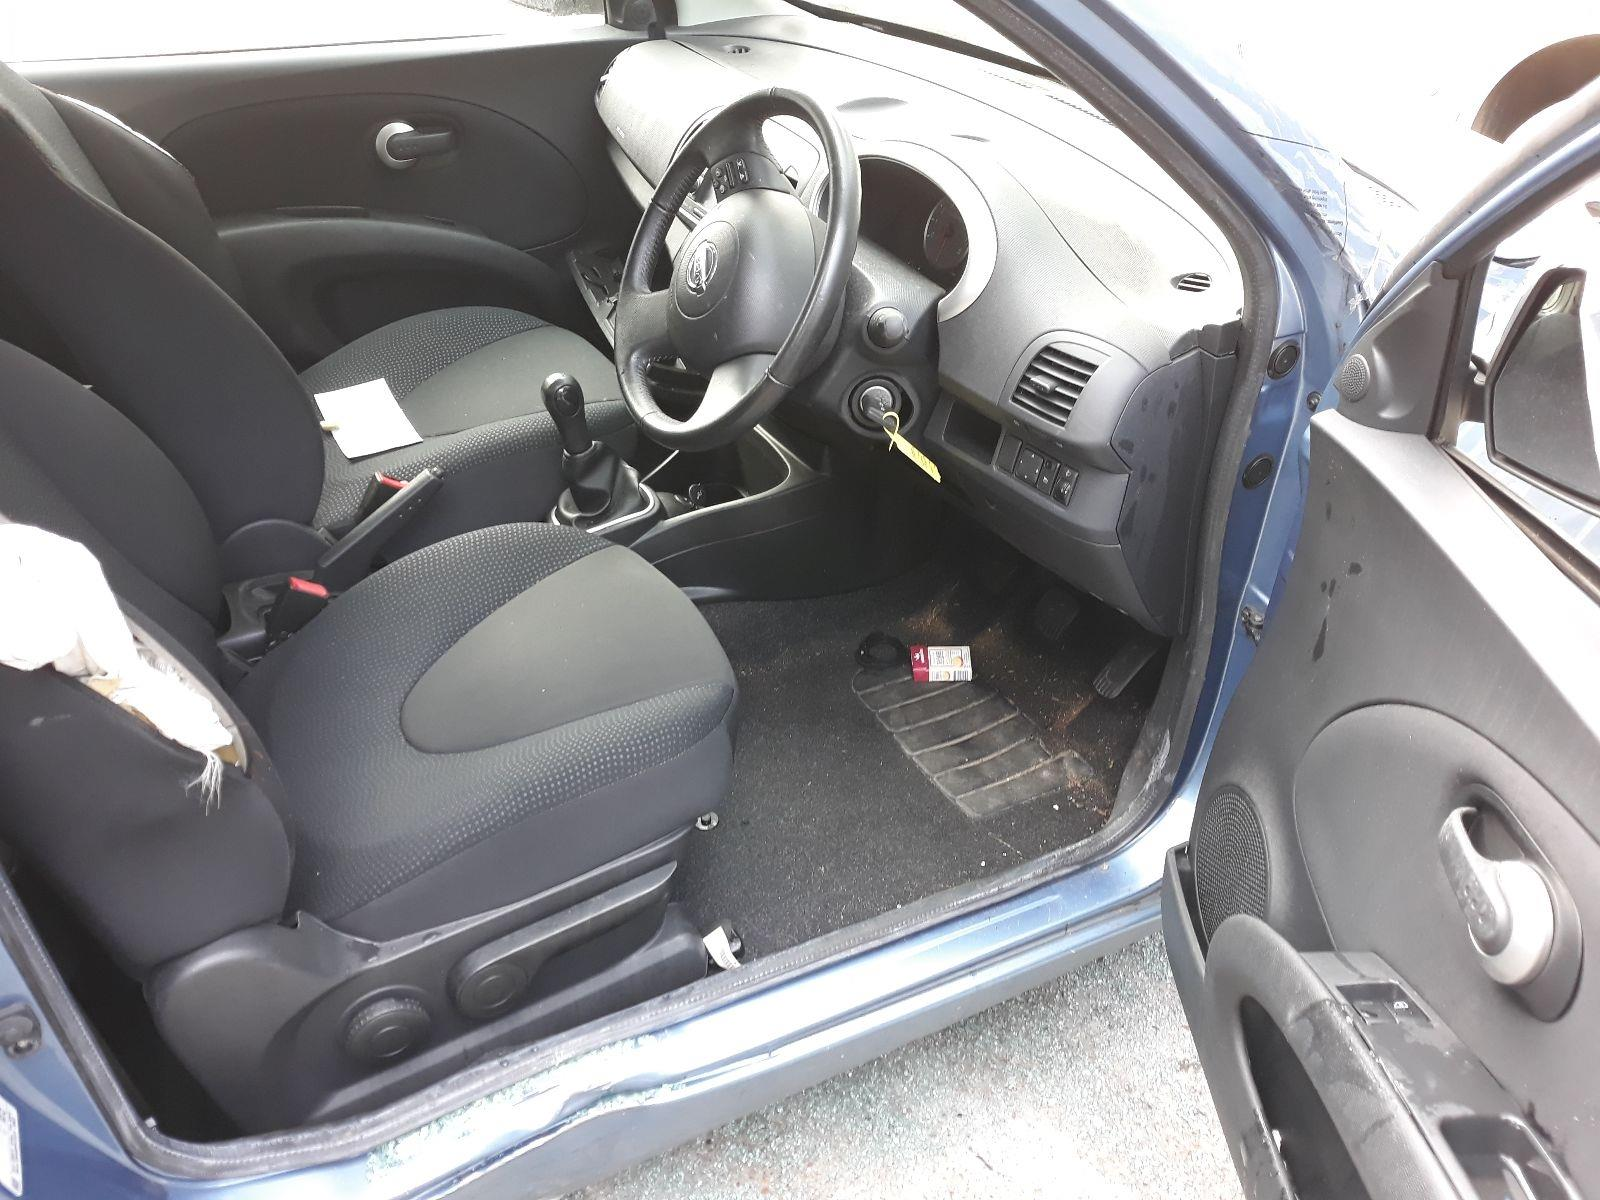 Nissan Micra 2007 To 2010 N-Tec 3 Door Hatchback / scrap / salvage car for  sale / auction | Silverlake Autoparts